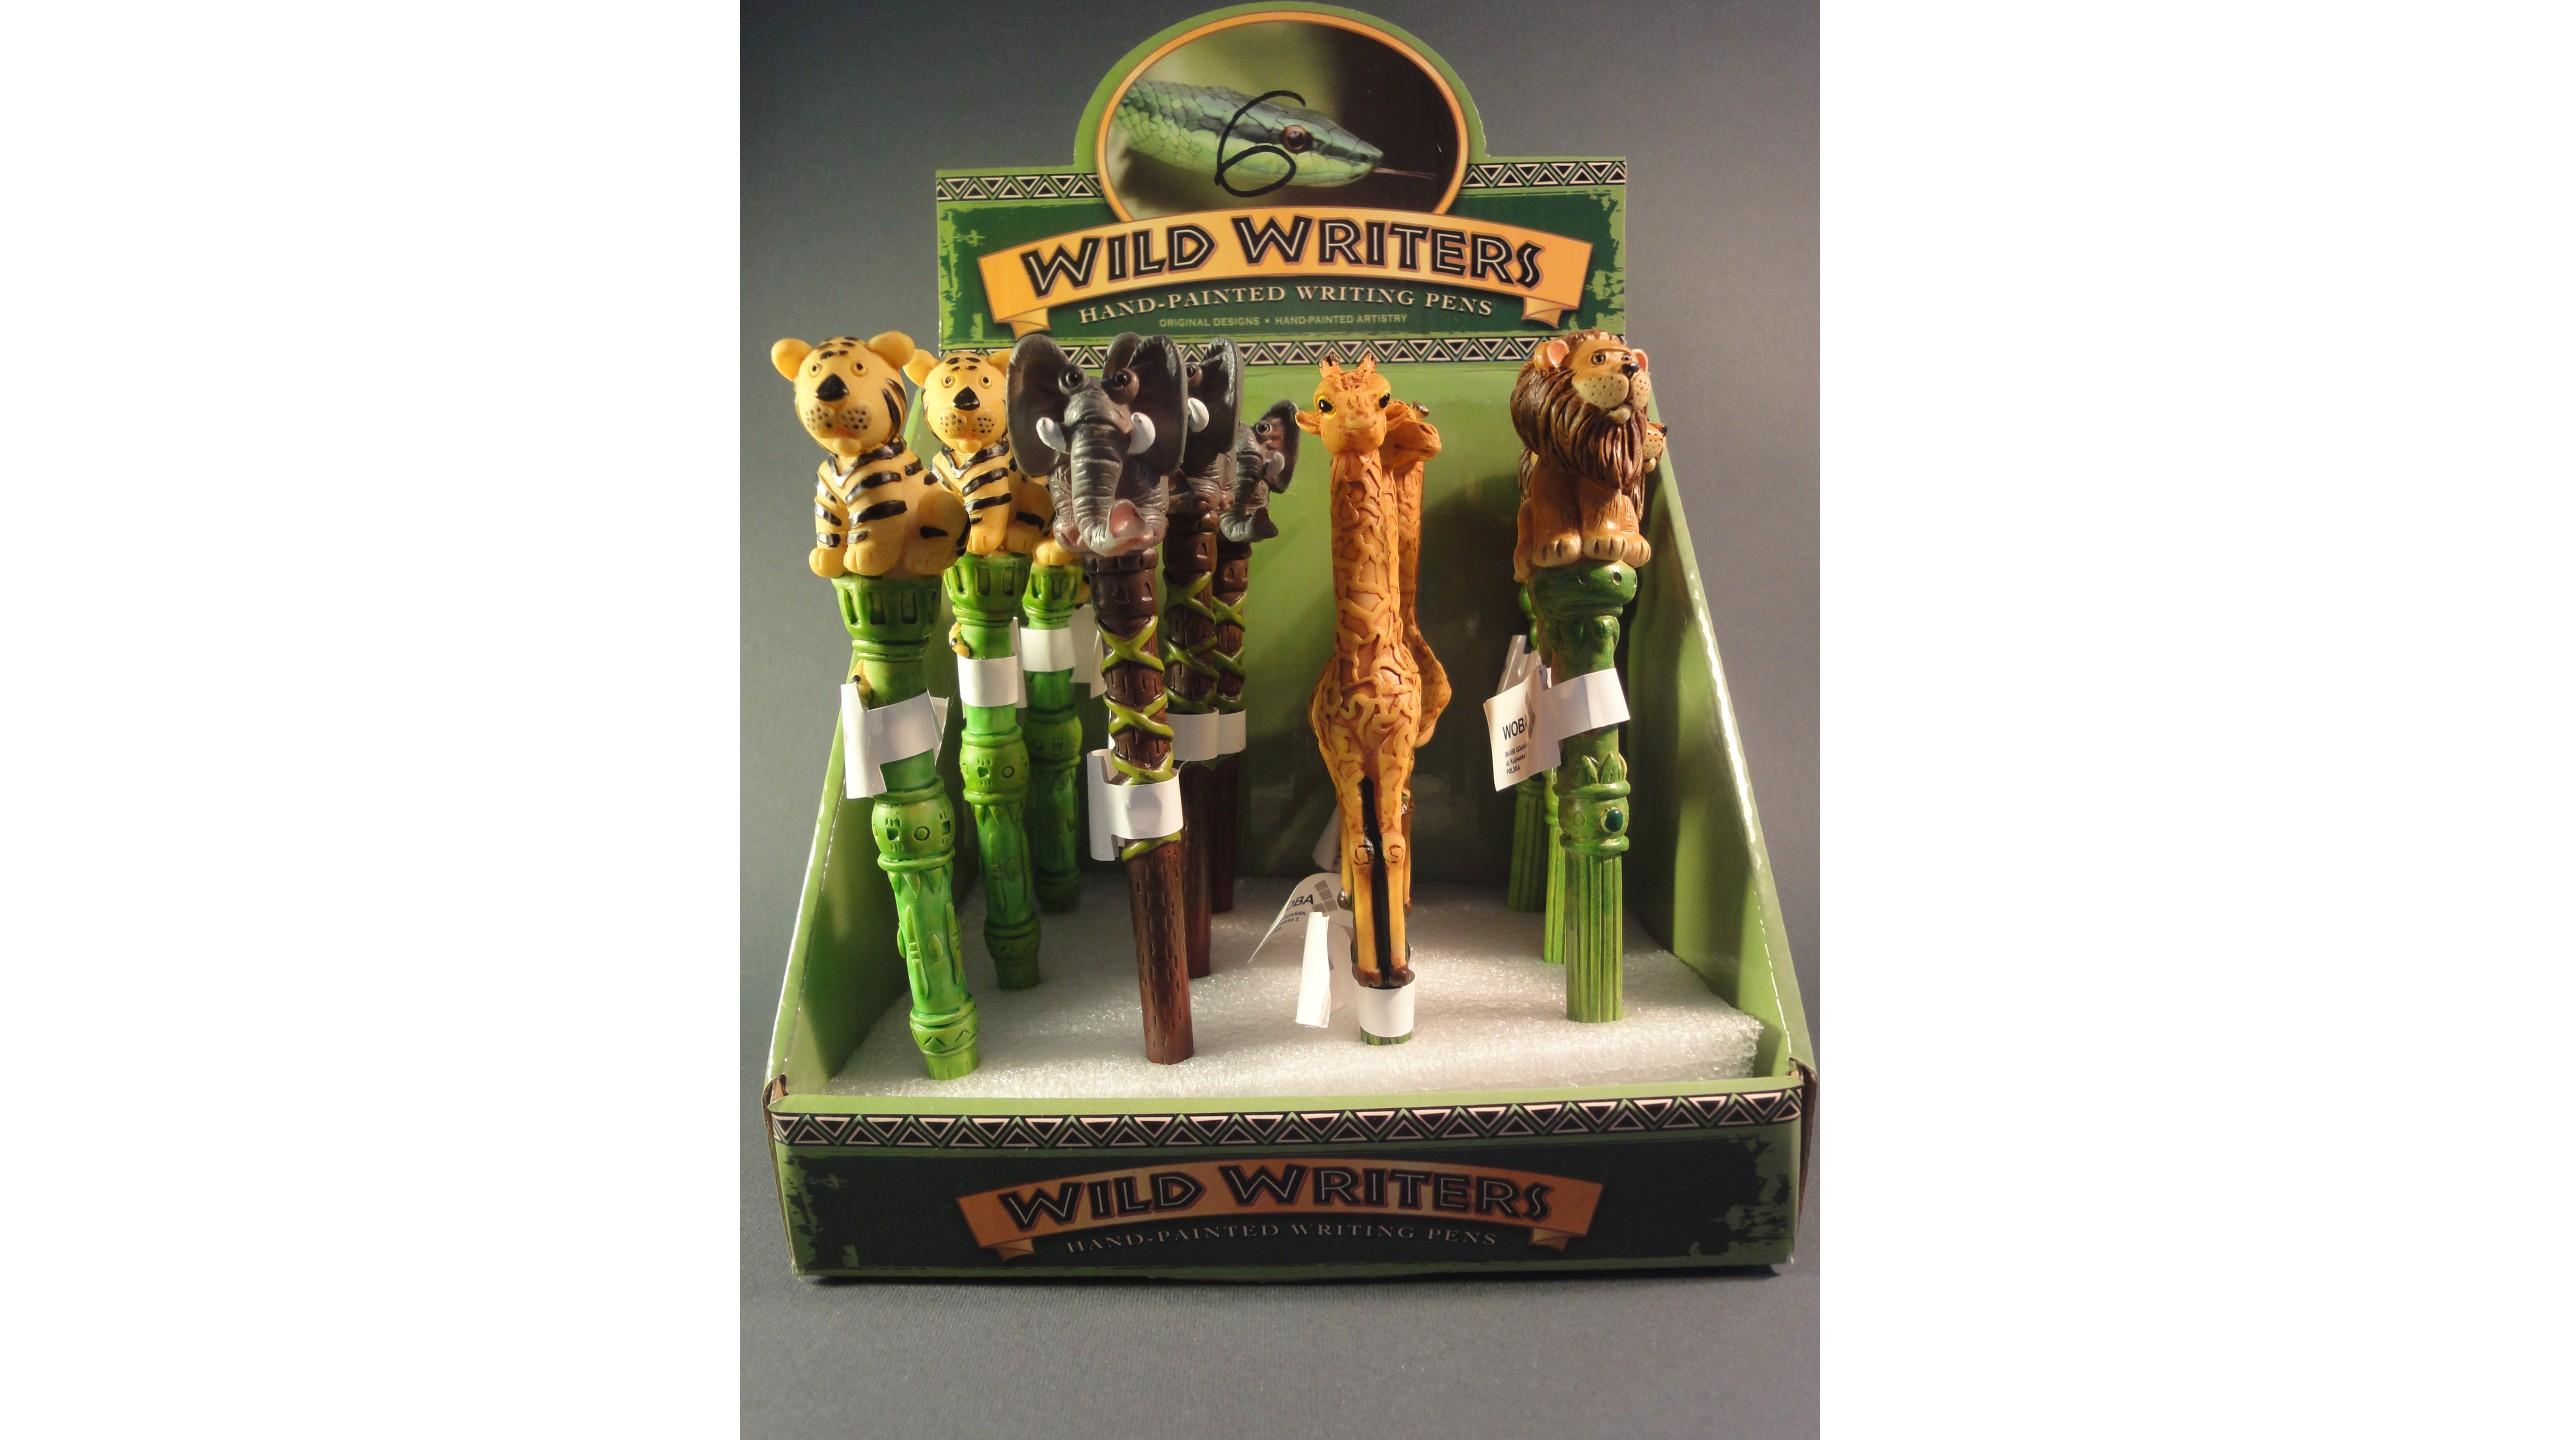 Pen - Mix 06 - Animals - Wild Writers